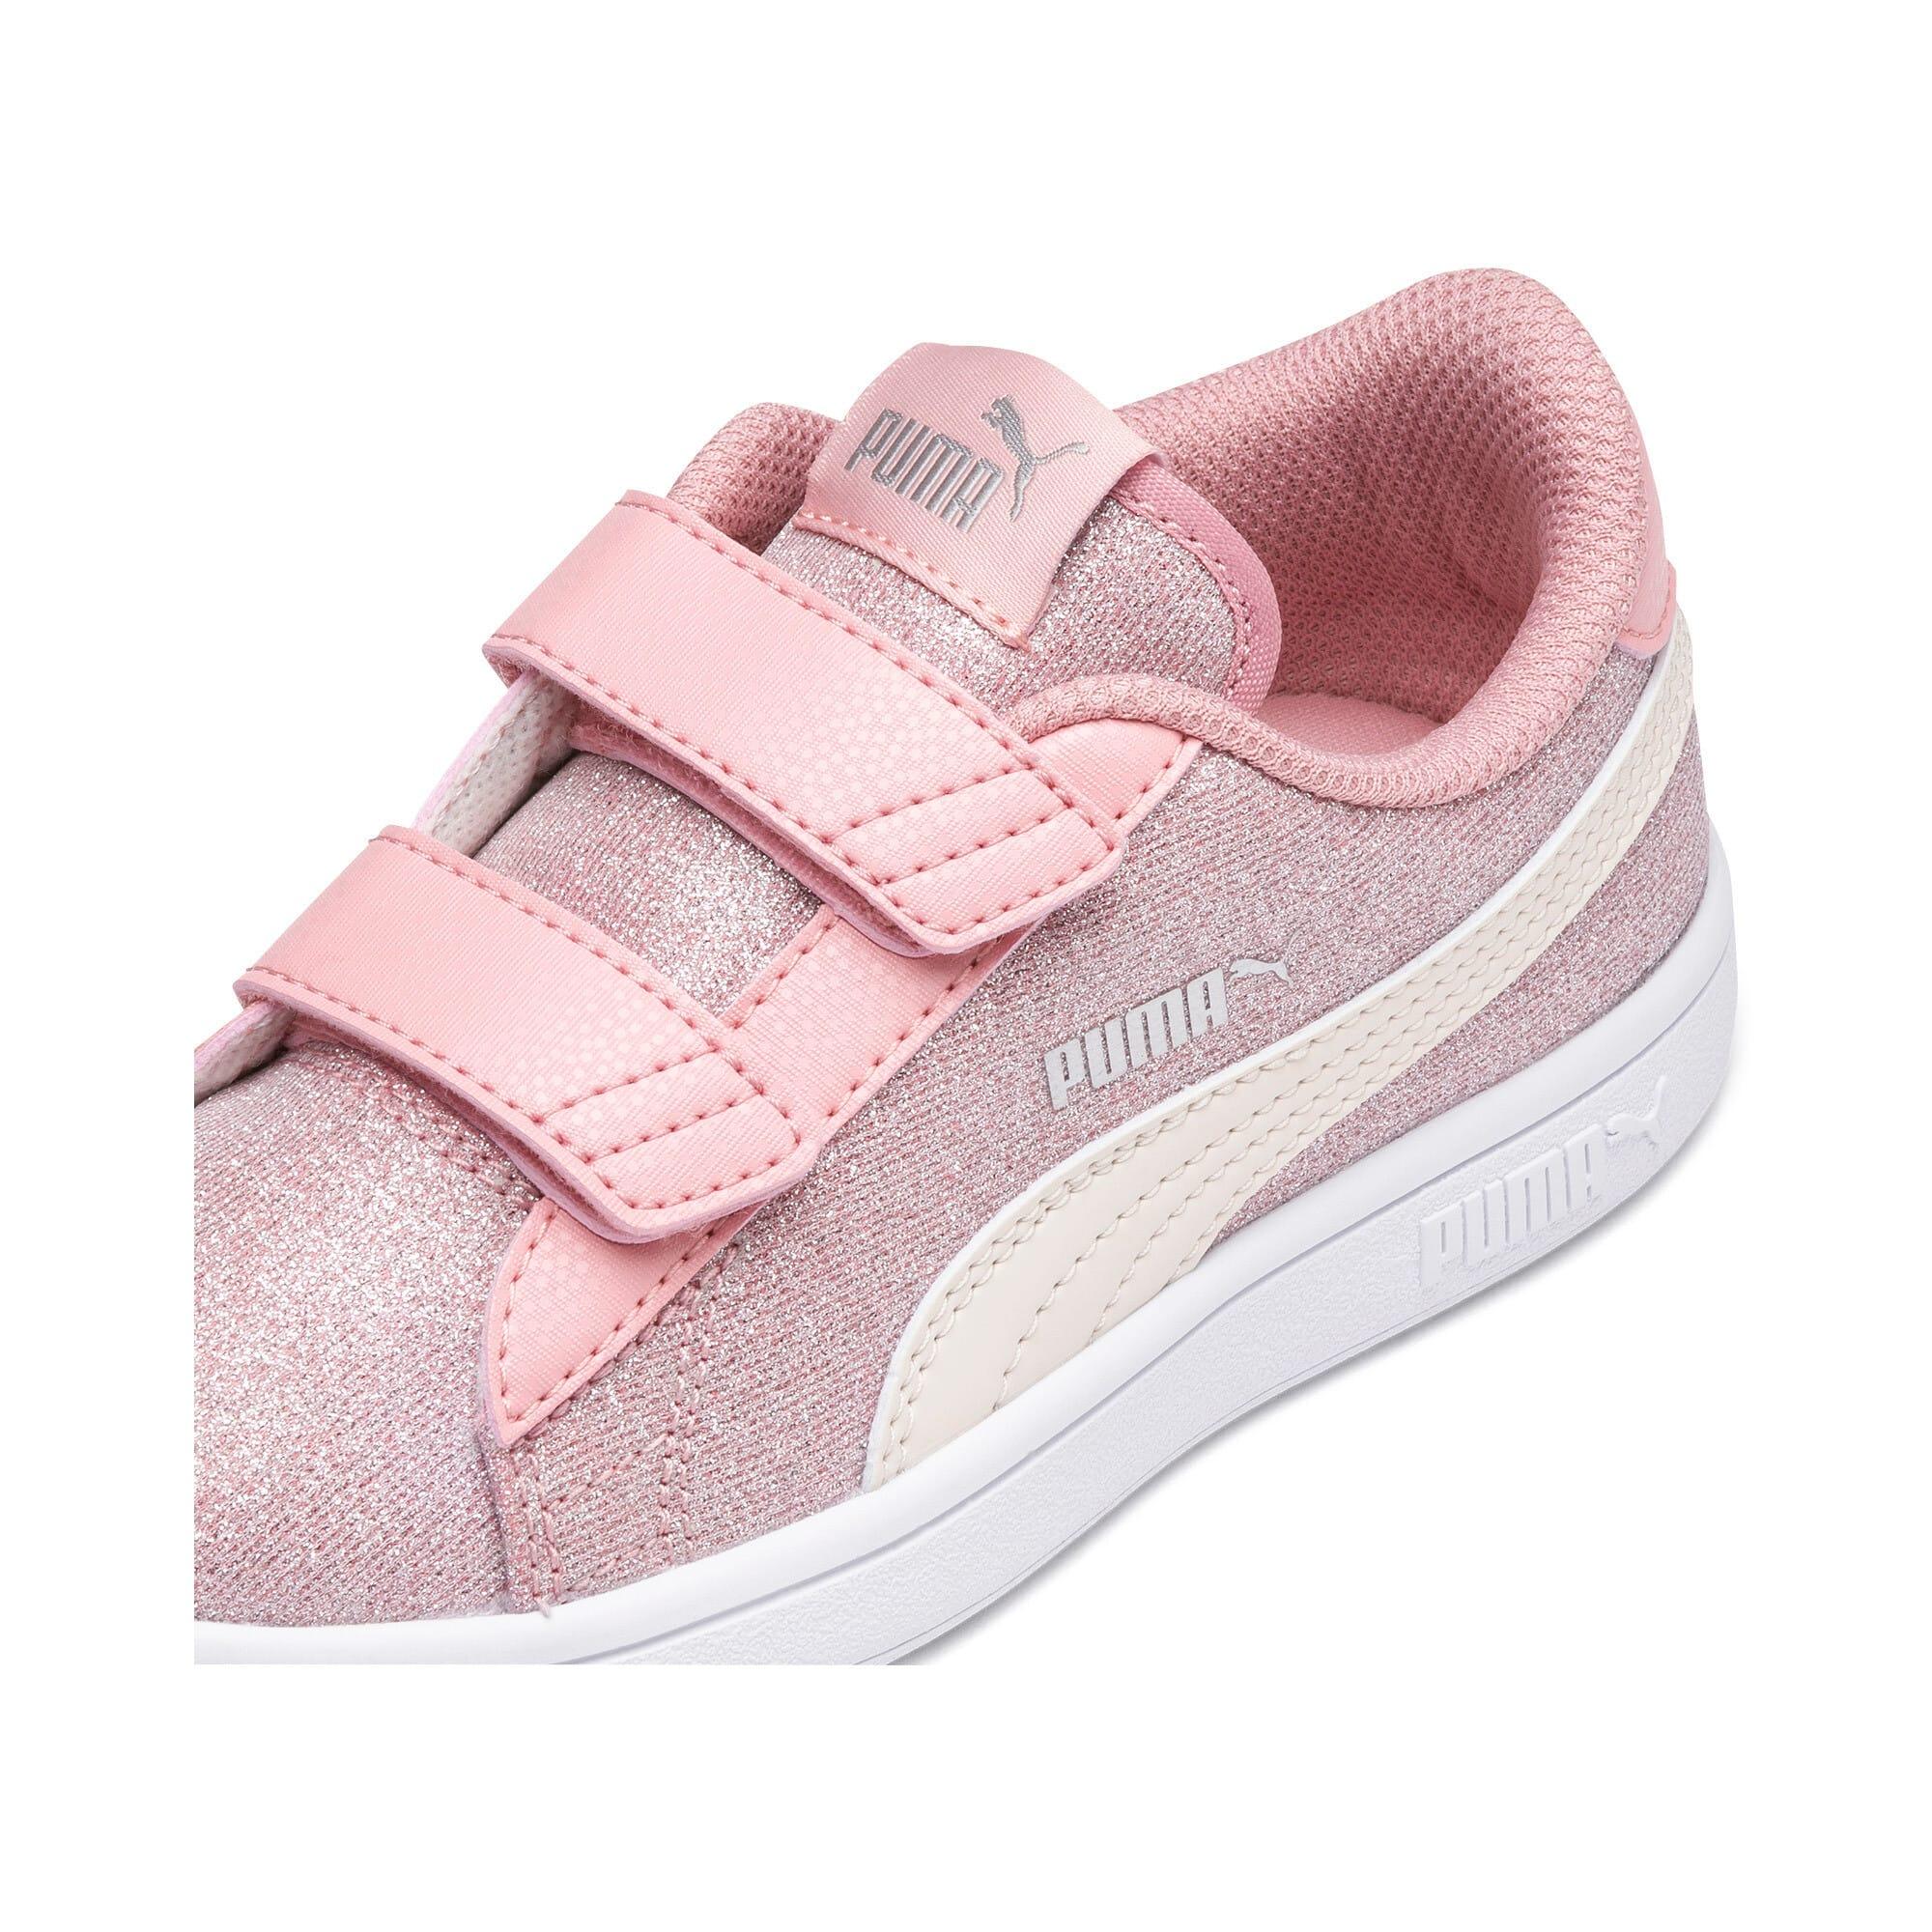 Thumbnail 7 of PUMA Smash v2 Glitz Glam Little Kids' Shoes, B Rose-P Parchment-Silv-Wht, medium